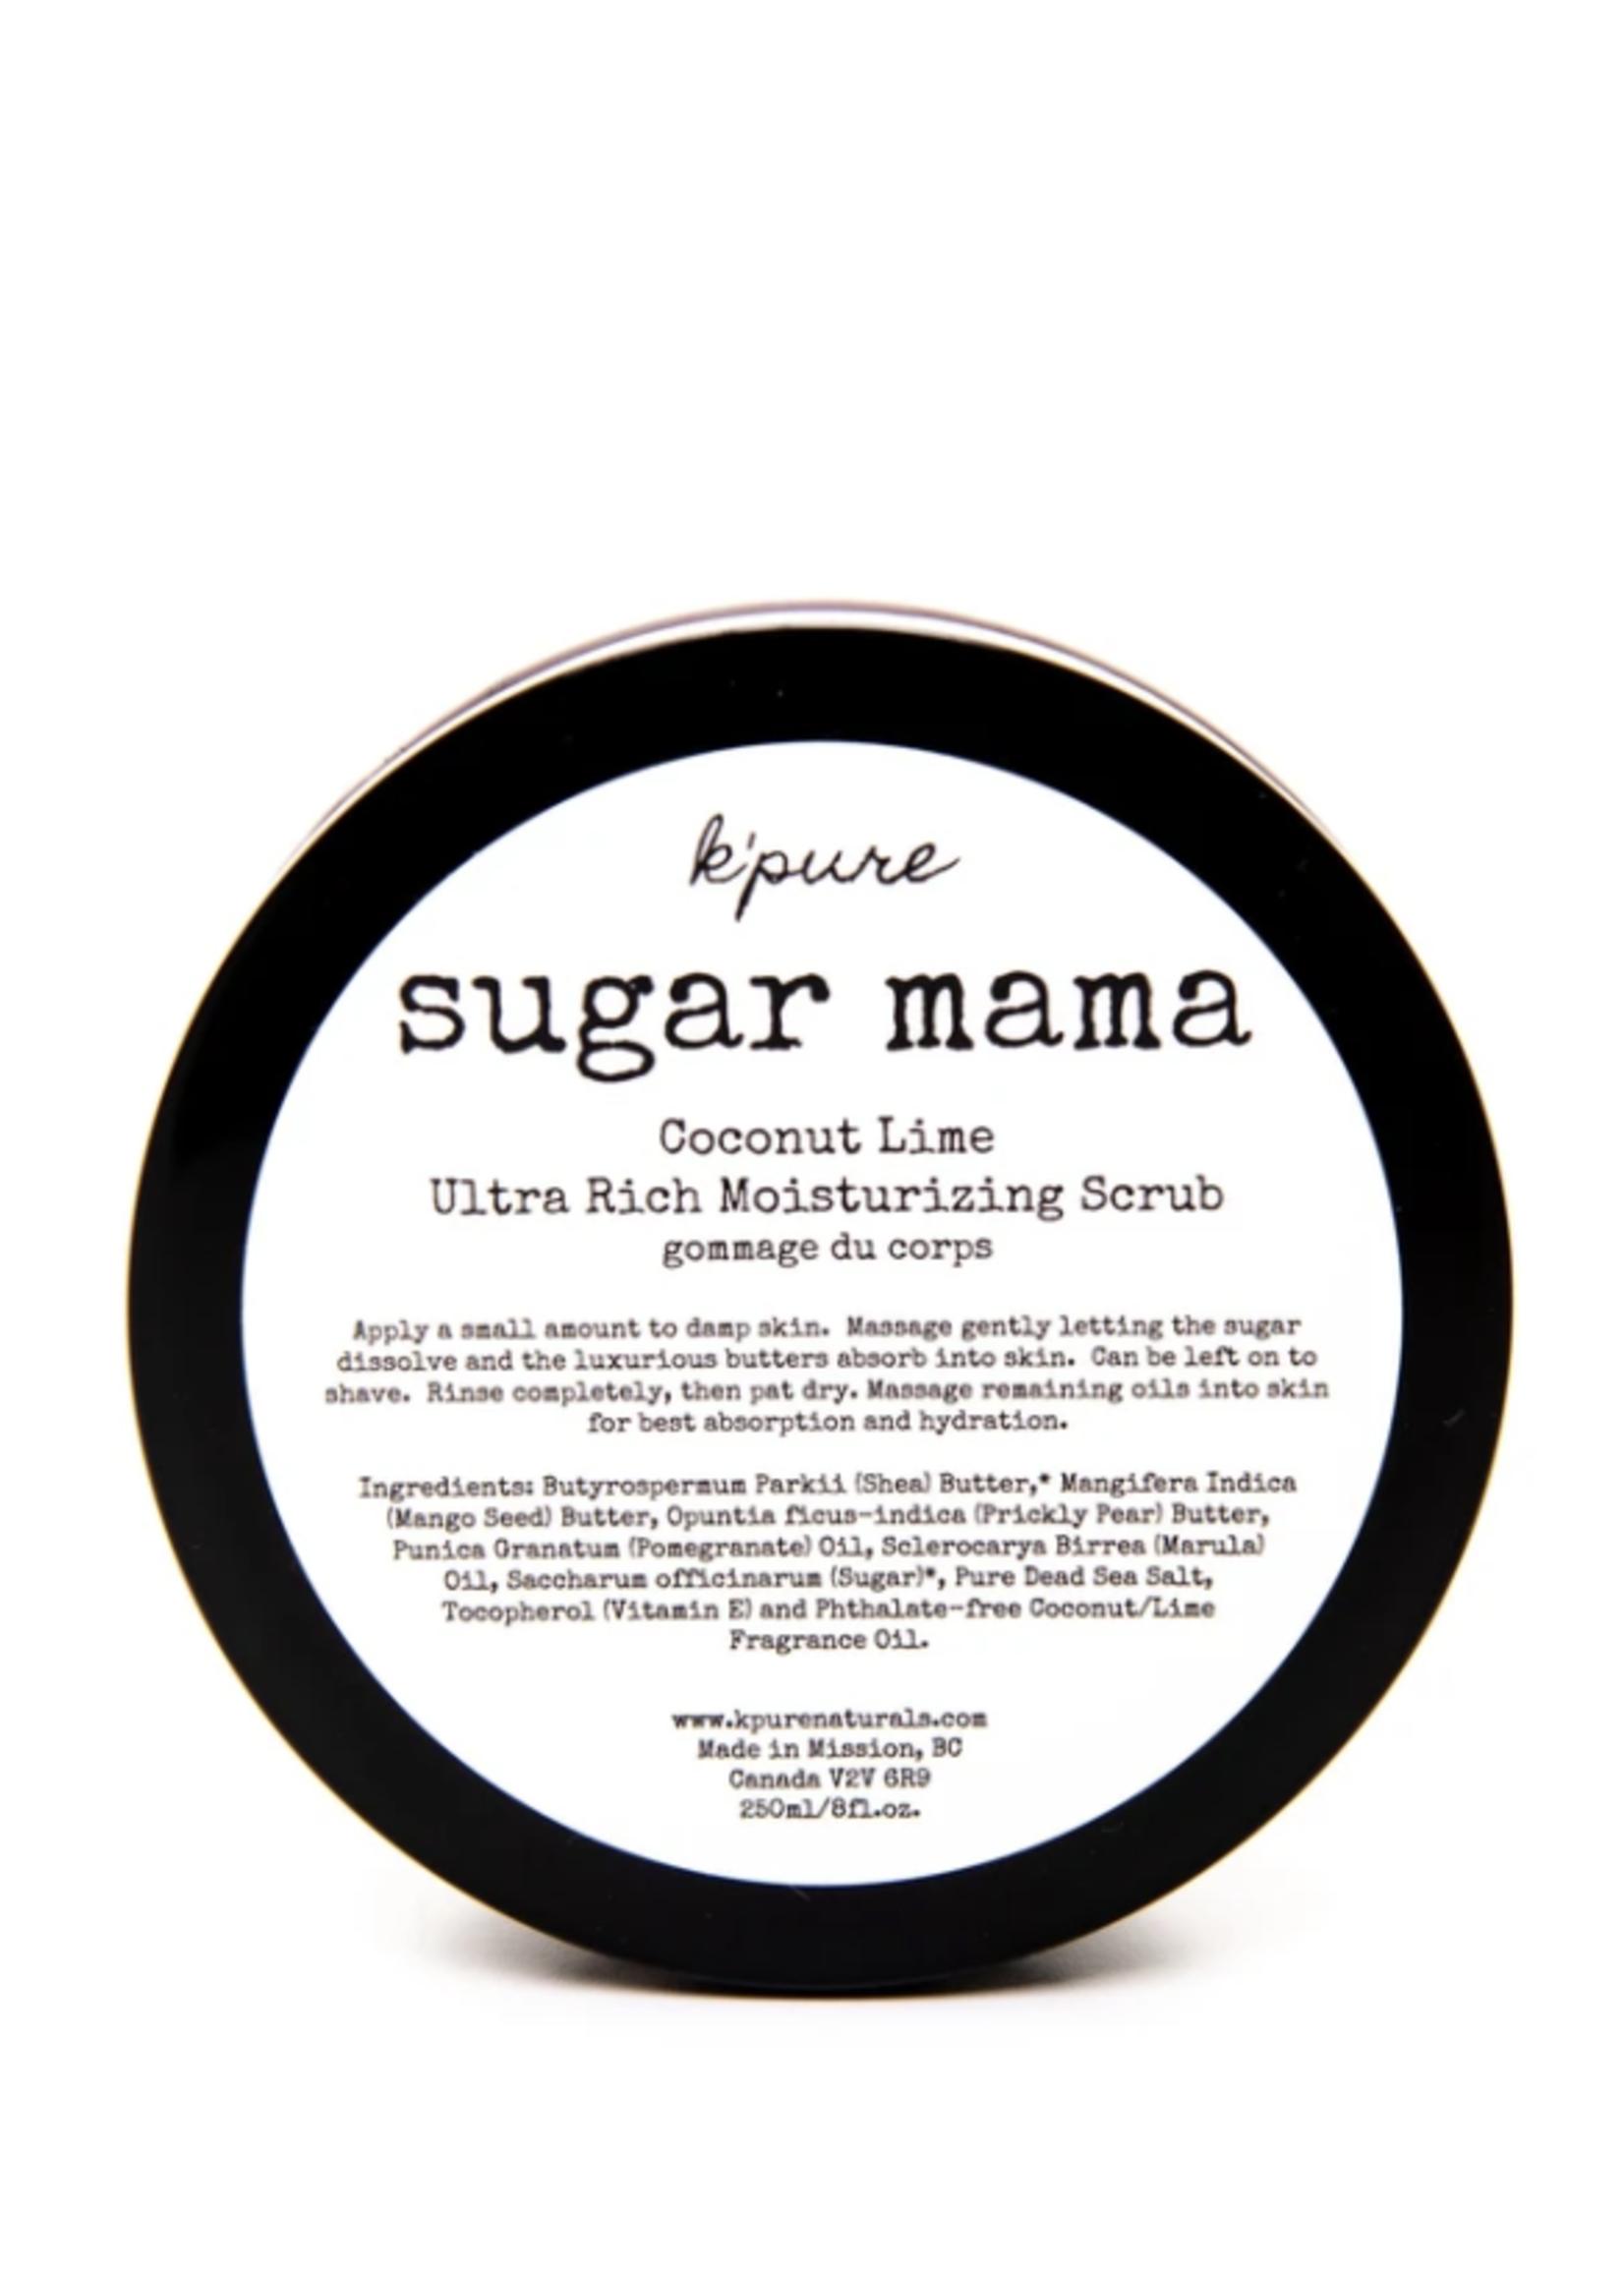 K'Pure Sugar Mama Whipped Scrub